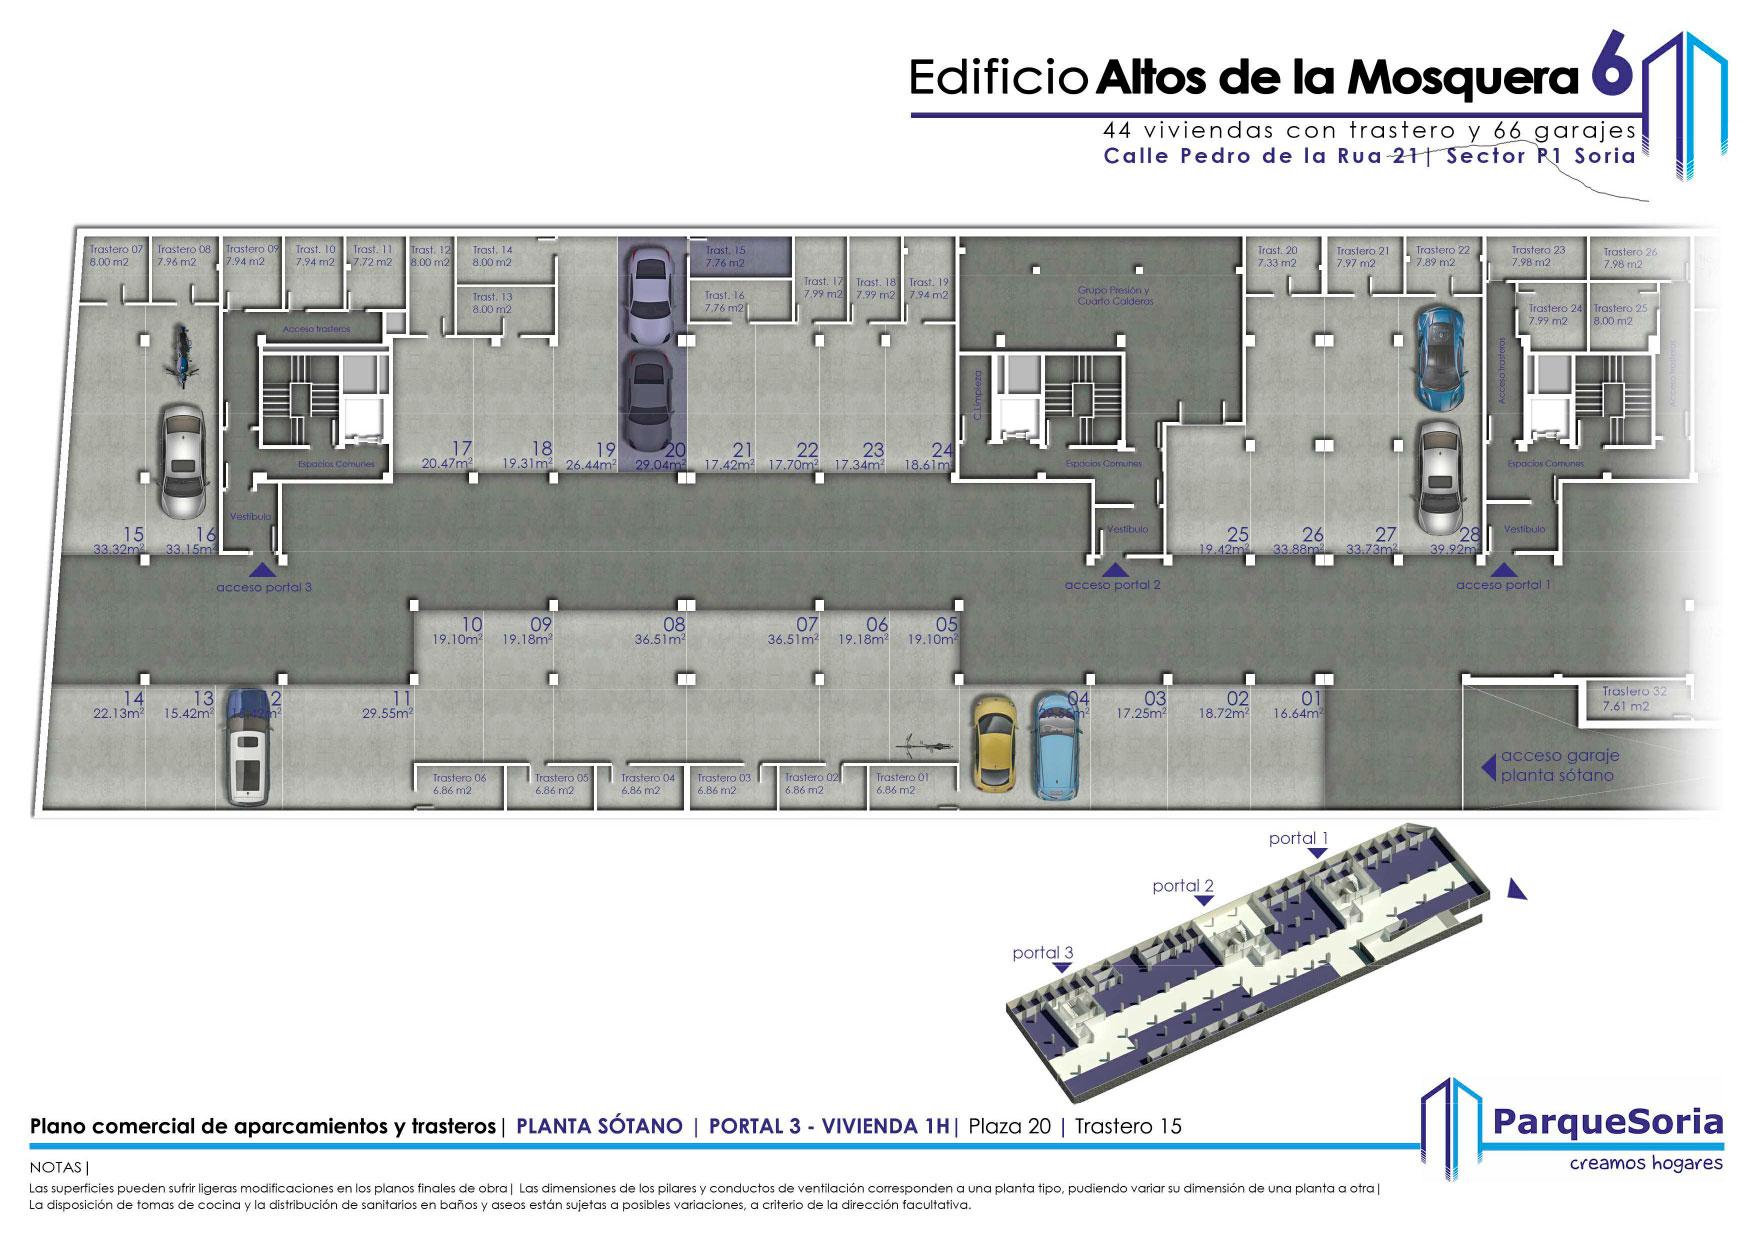 Parquesoria-Altos-de-la-mosquera-6-1H-2